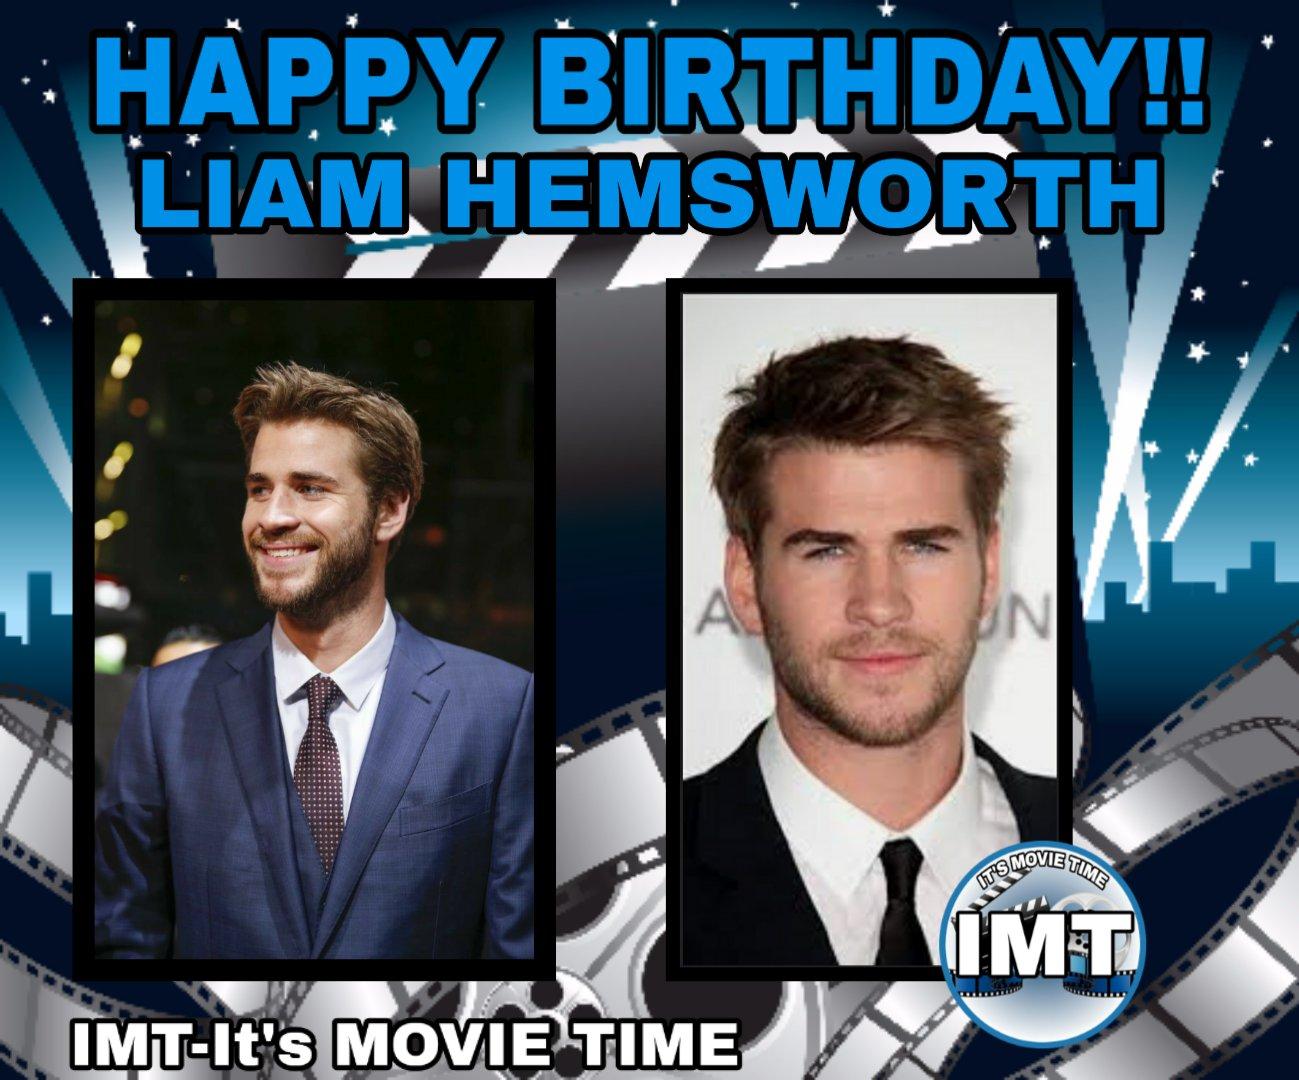 Happy Birthday to Liam Hemsworth! The actor is celebrating 30 years.